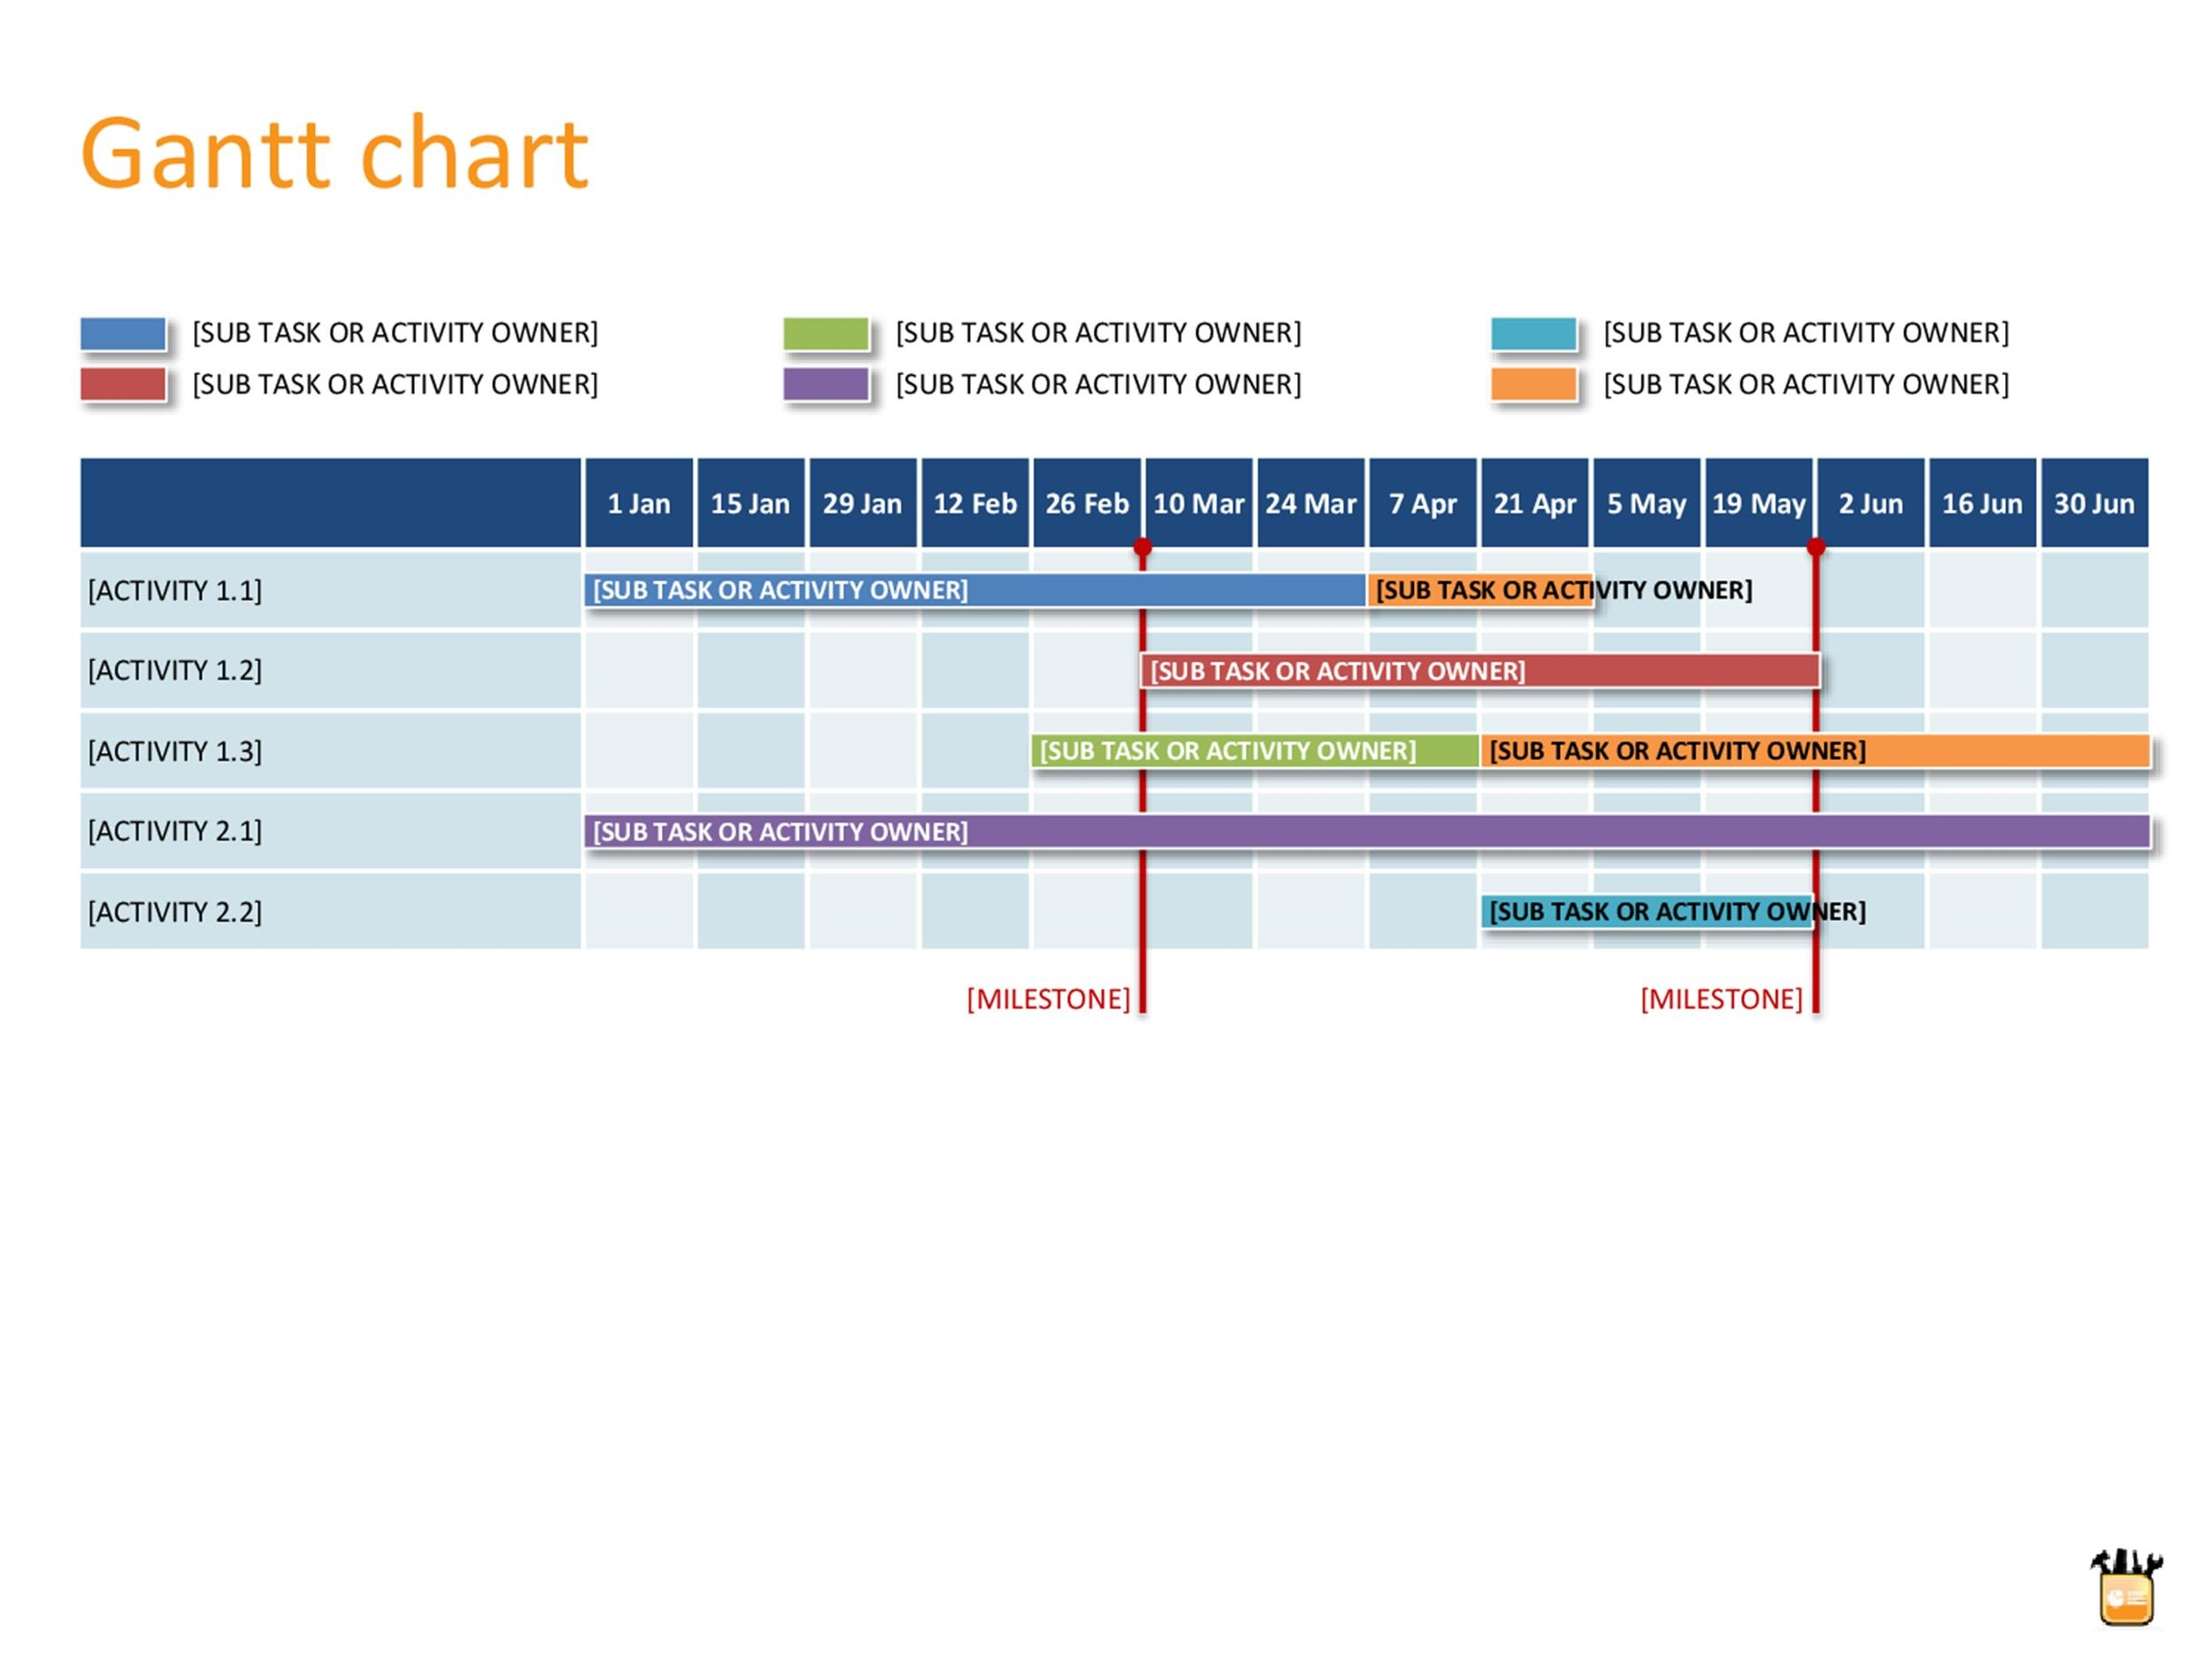 007 Unusual Free Gantt Chart Template Excel Idea  2017 Dynamic DownloadFull